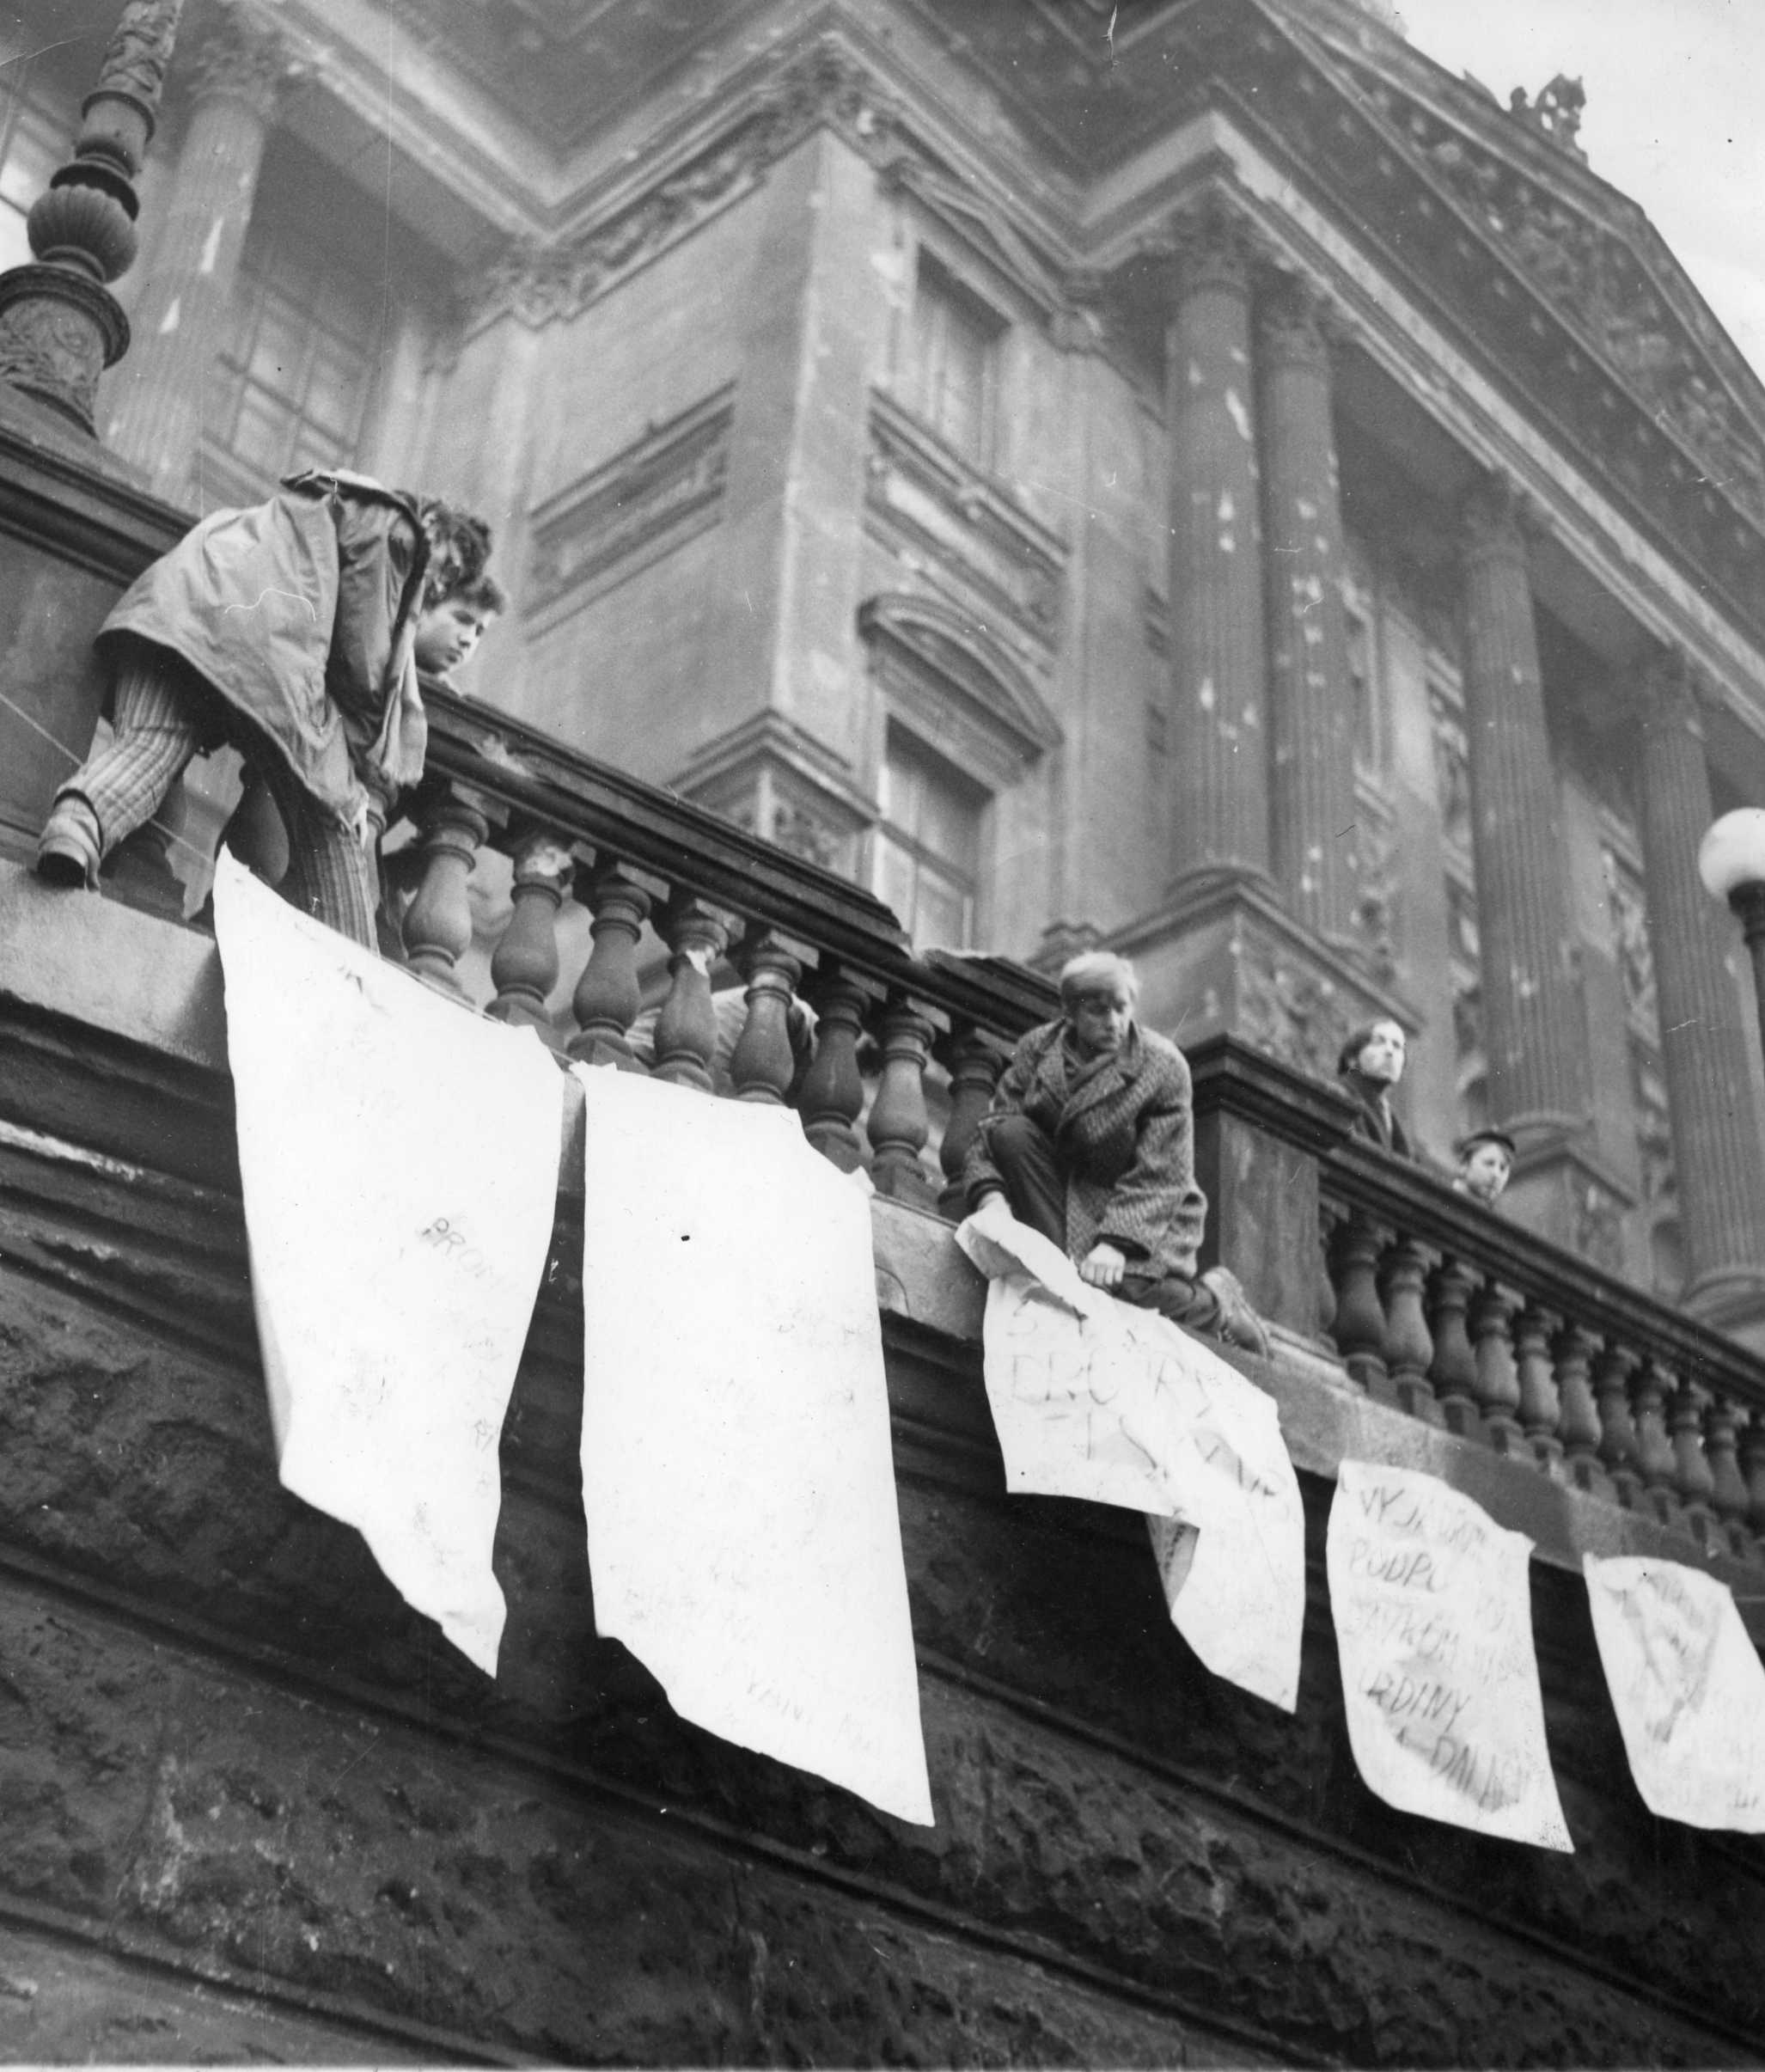 Demonstration in Prague, 1969 (illustrative photo)